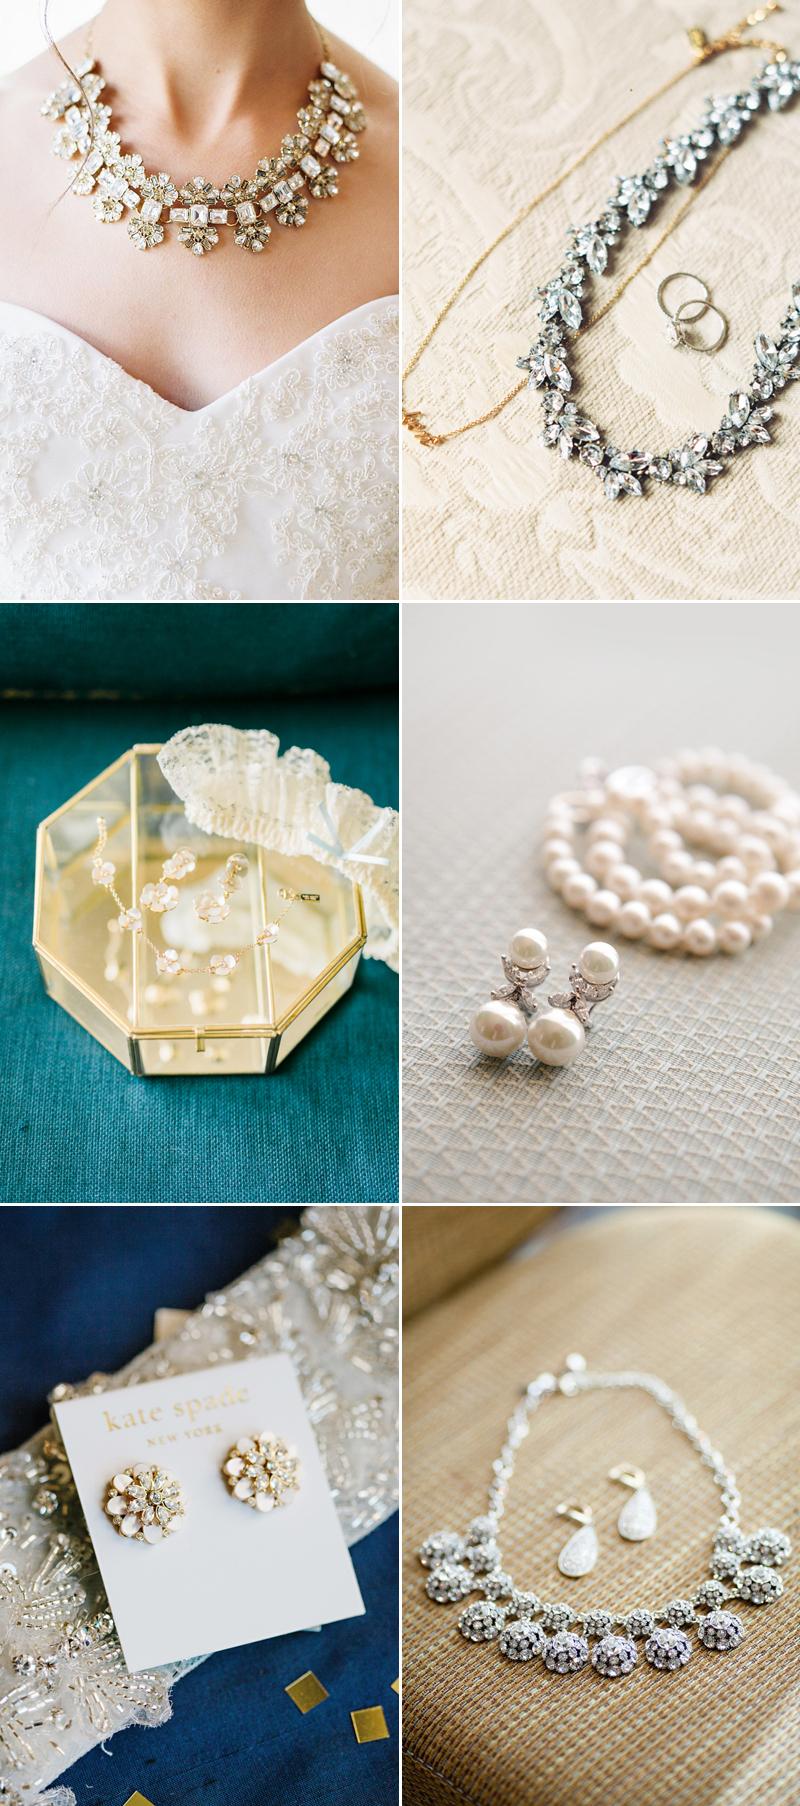 jewelry03-KateSpade